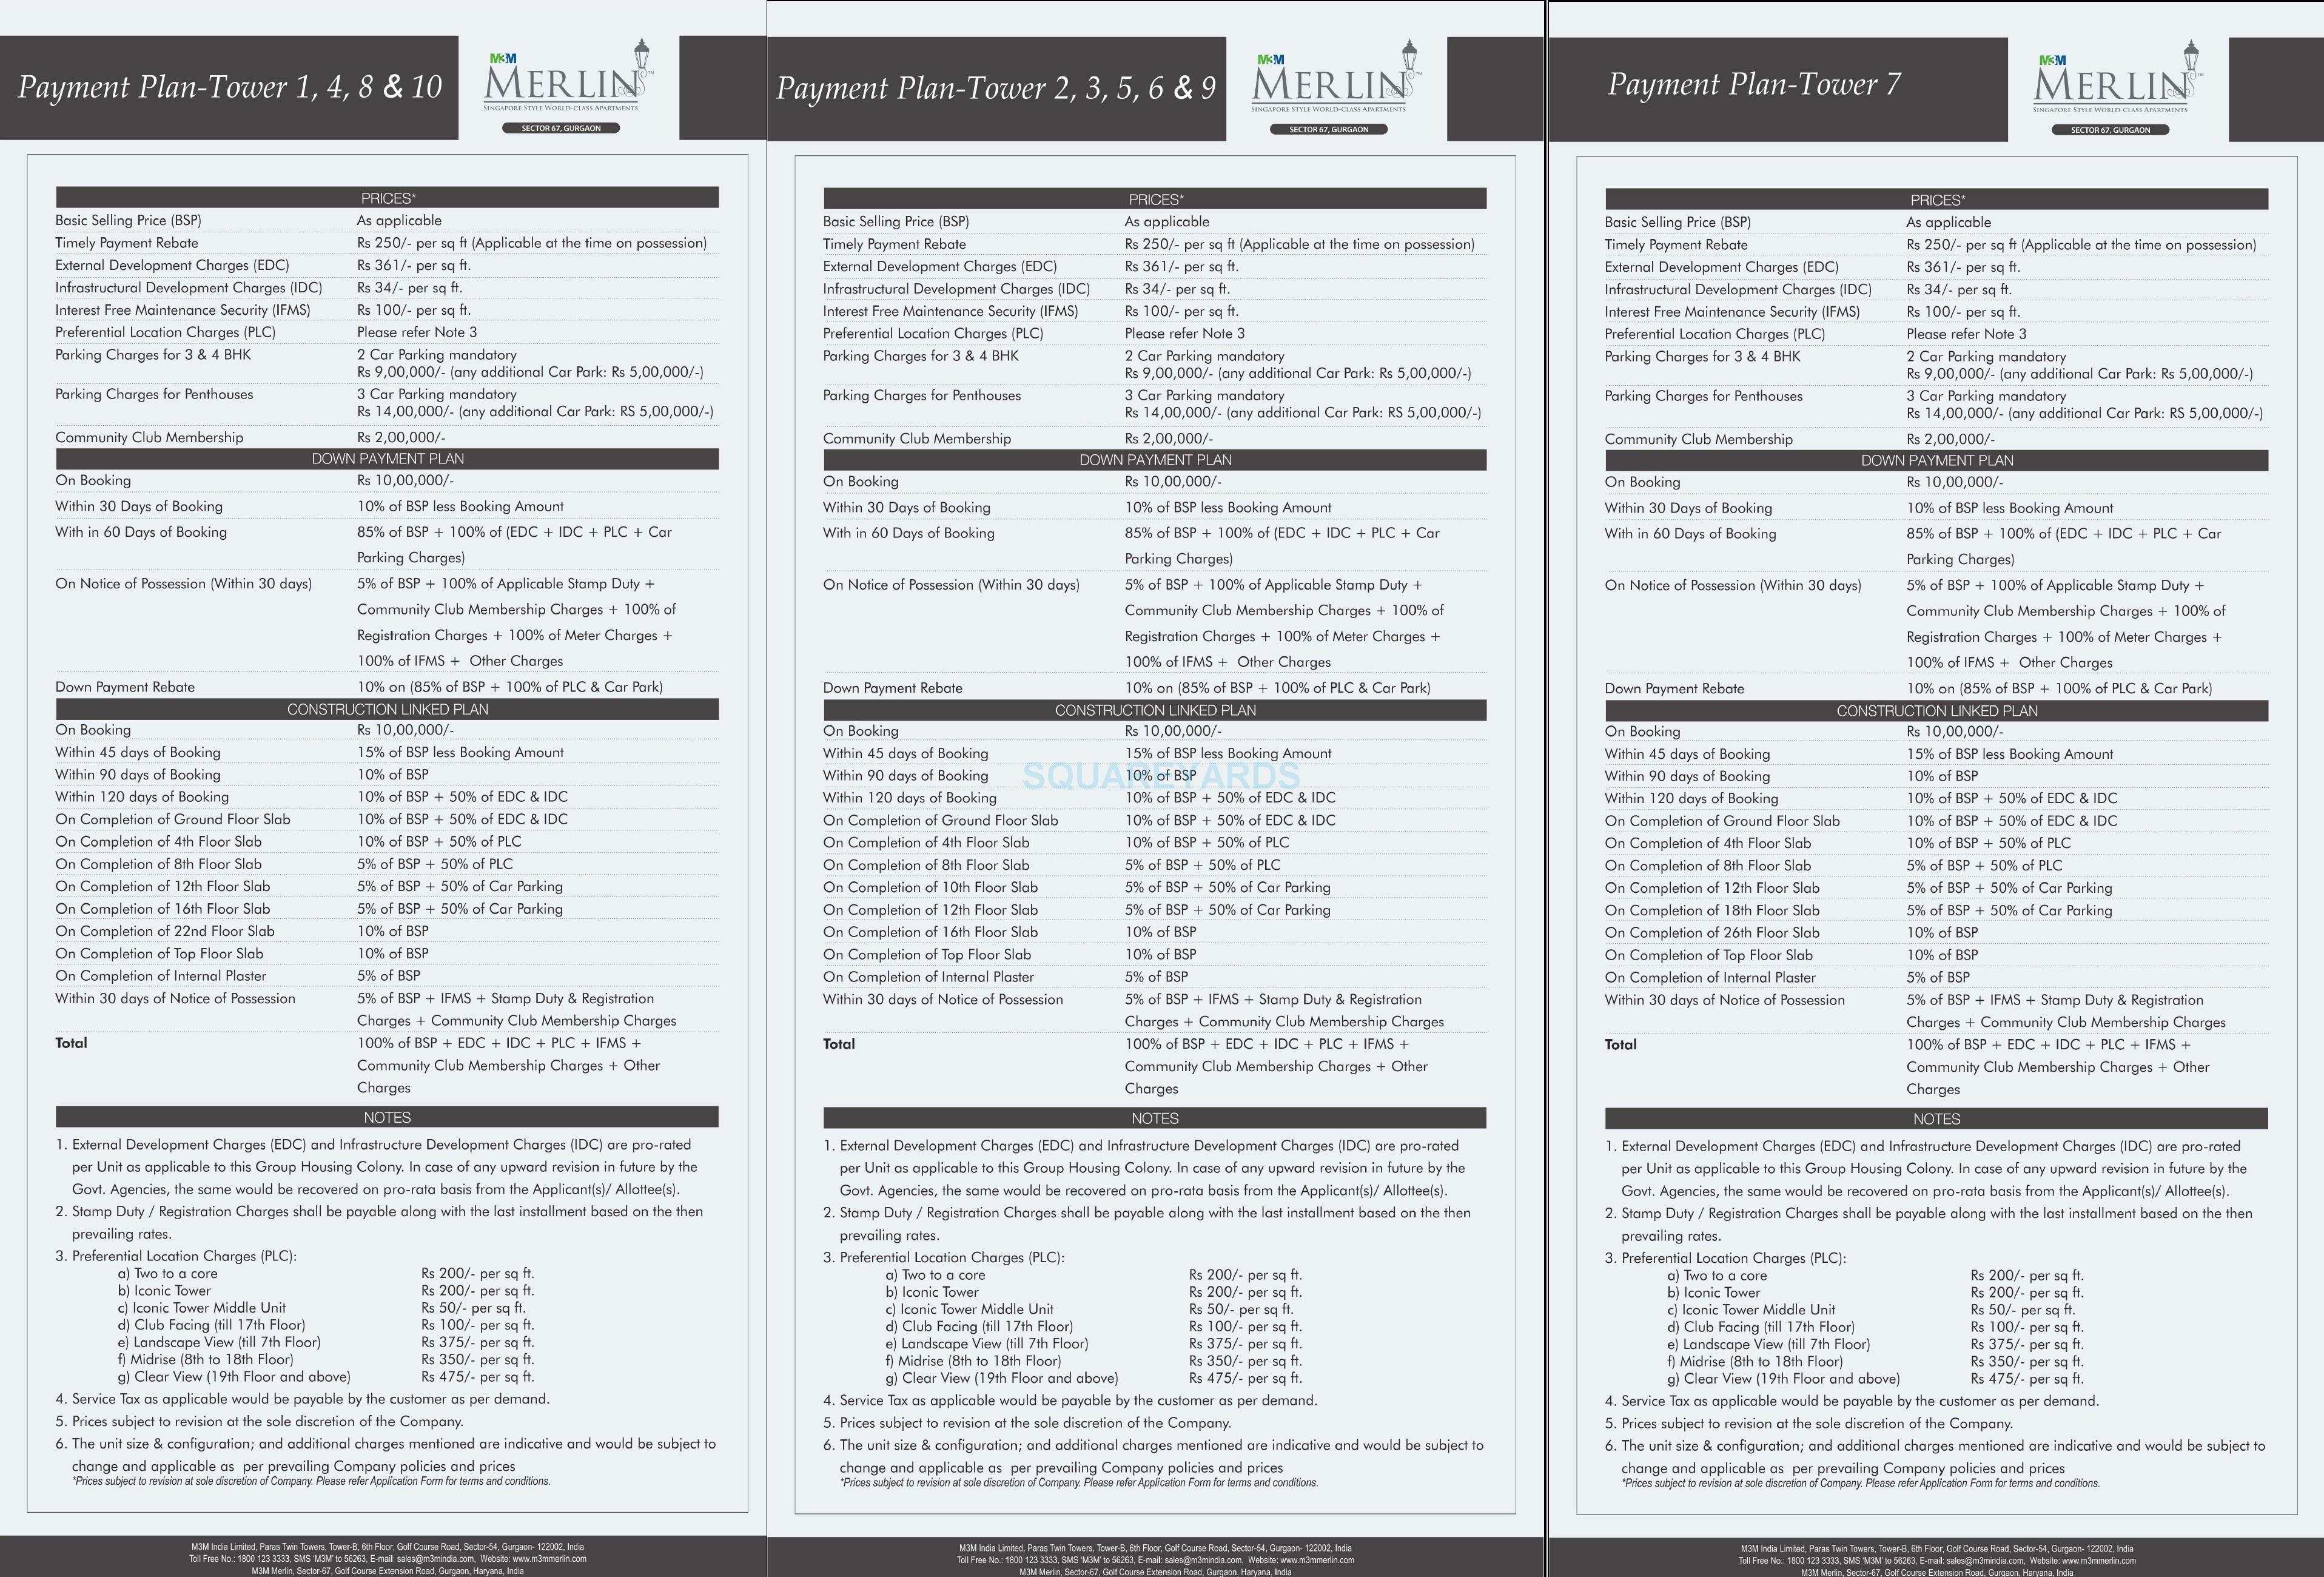 m3m merlin payment plan image1